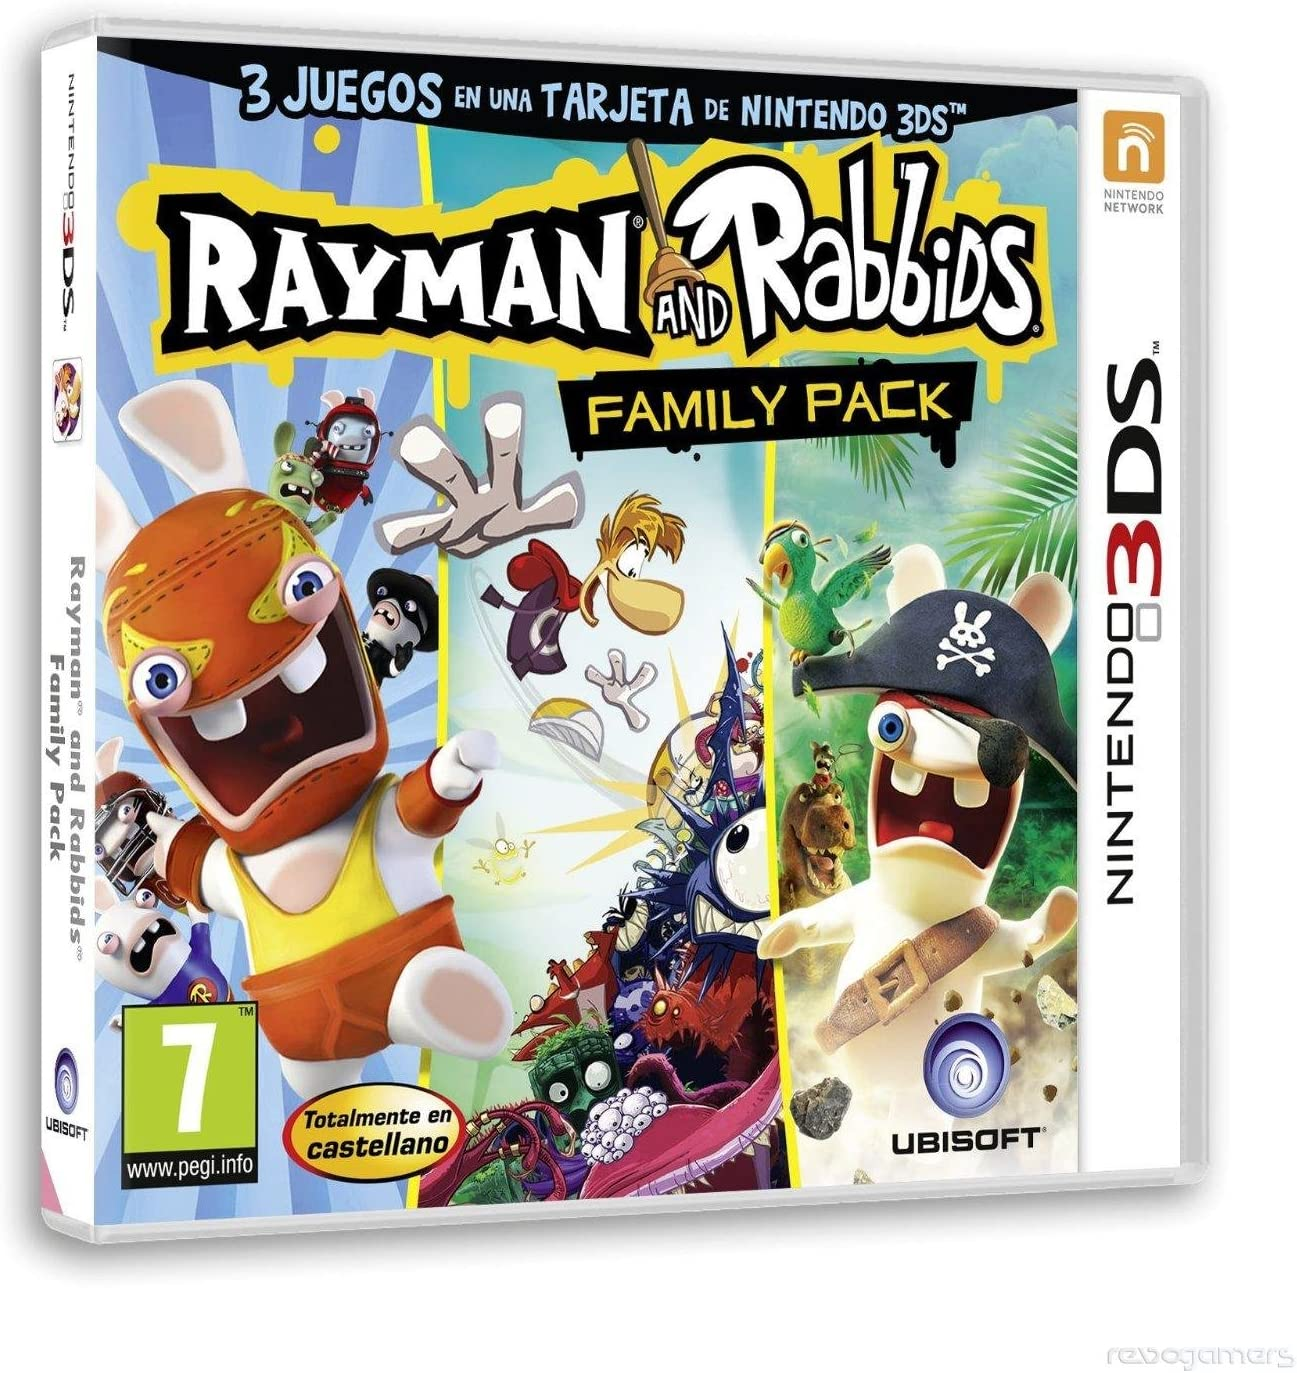 Rayman & Rabbids: Family Pack: Amazon.es: Videojuegos